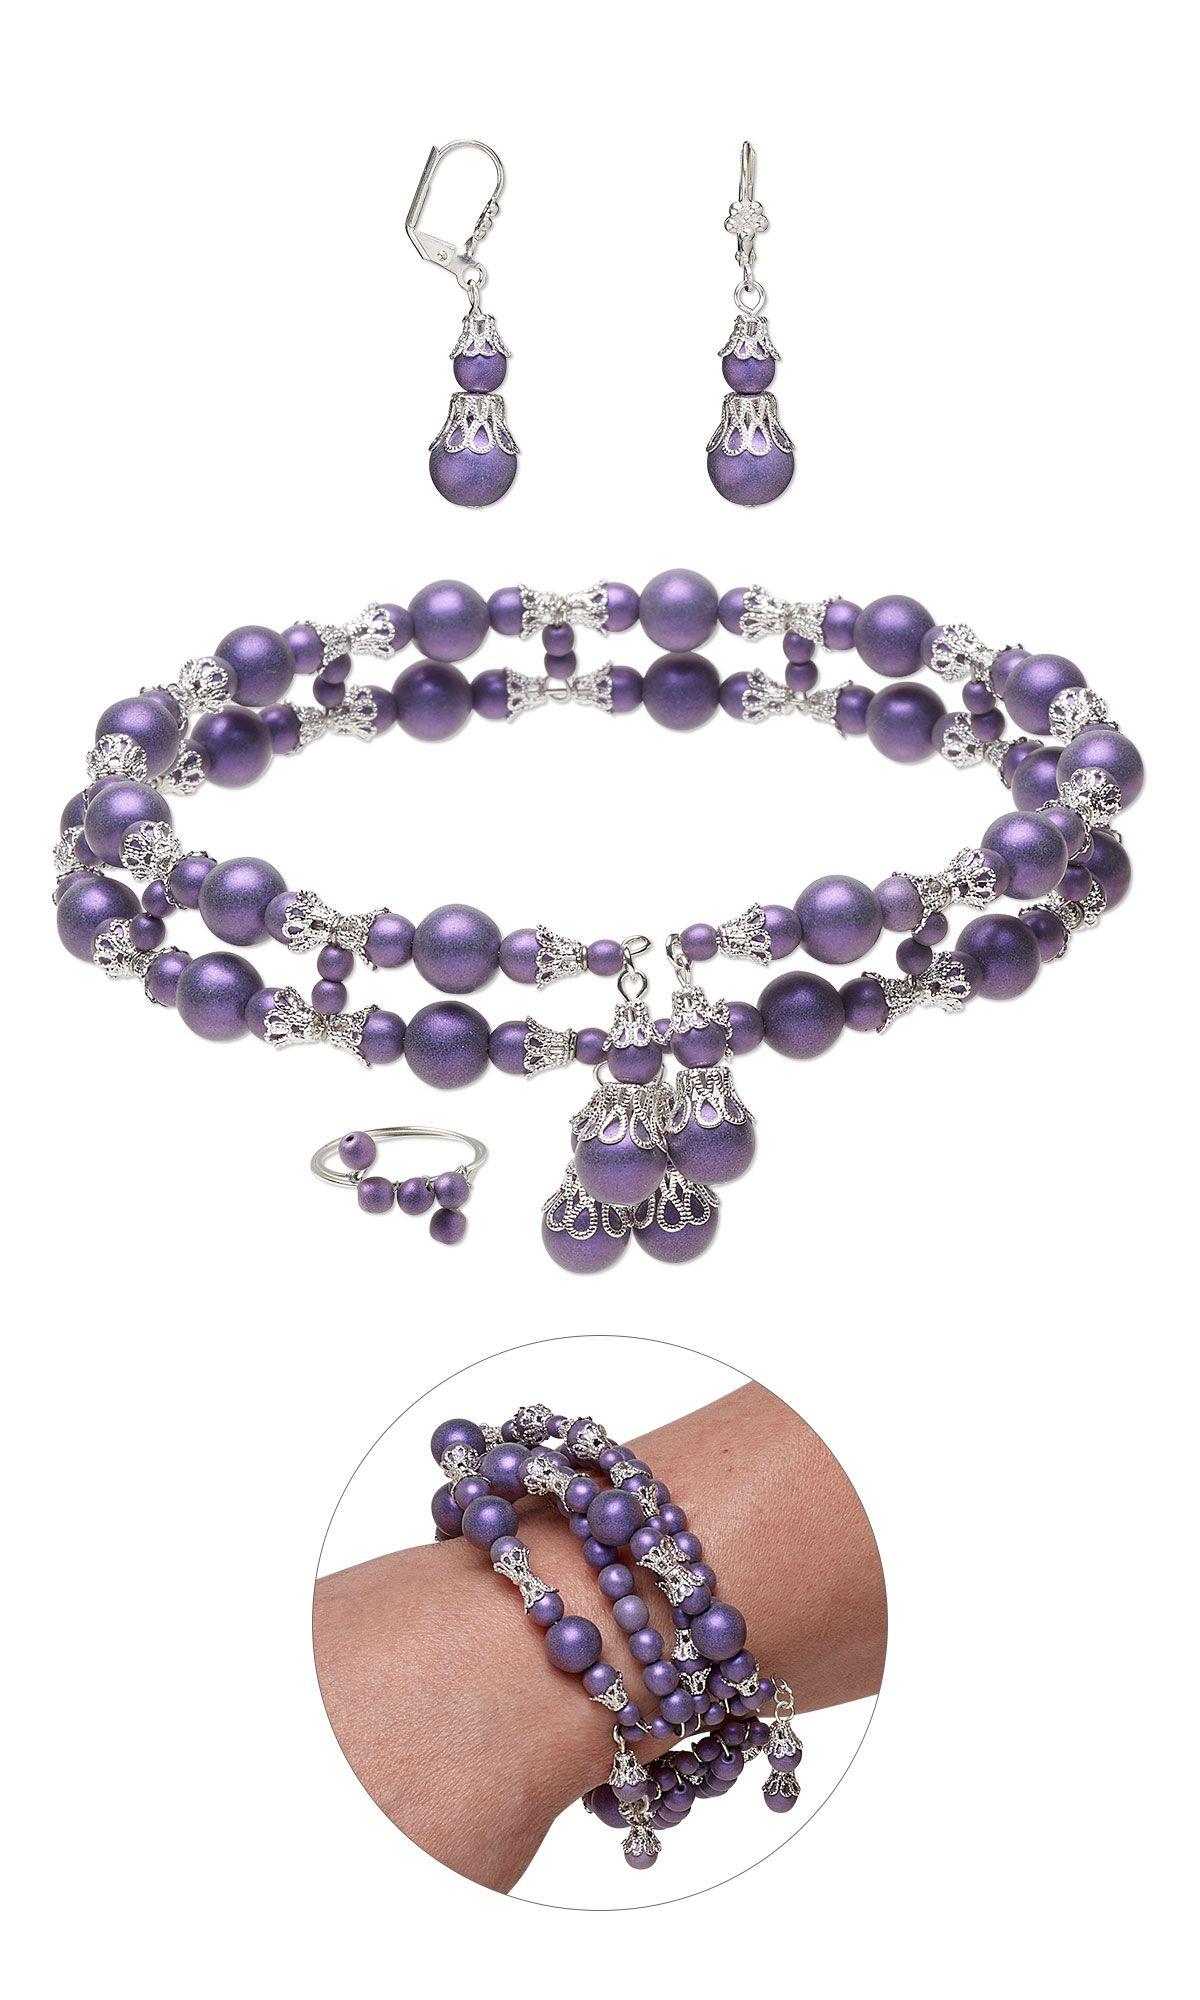 Jewelry Design - Memory Wire Choker-Style Necklace, Bracelet,Toe ...